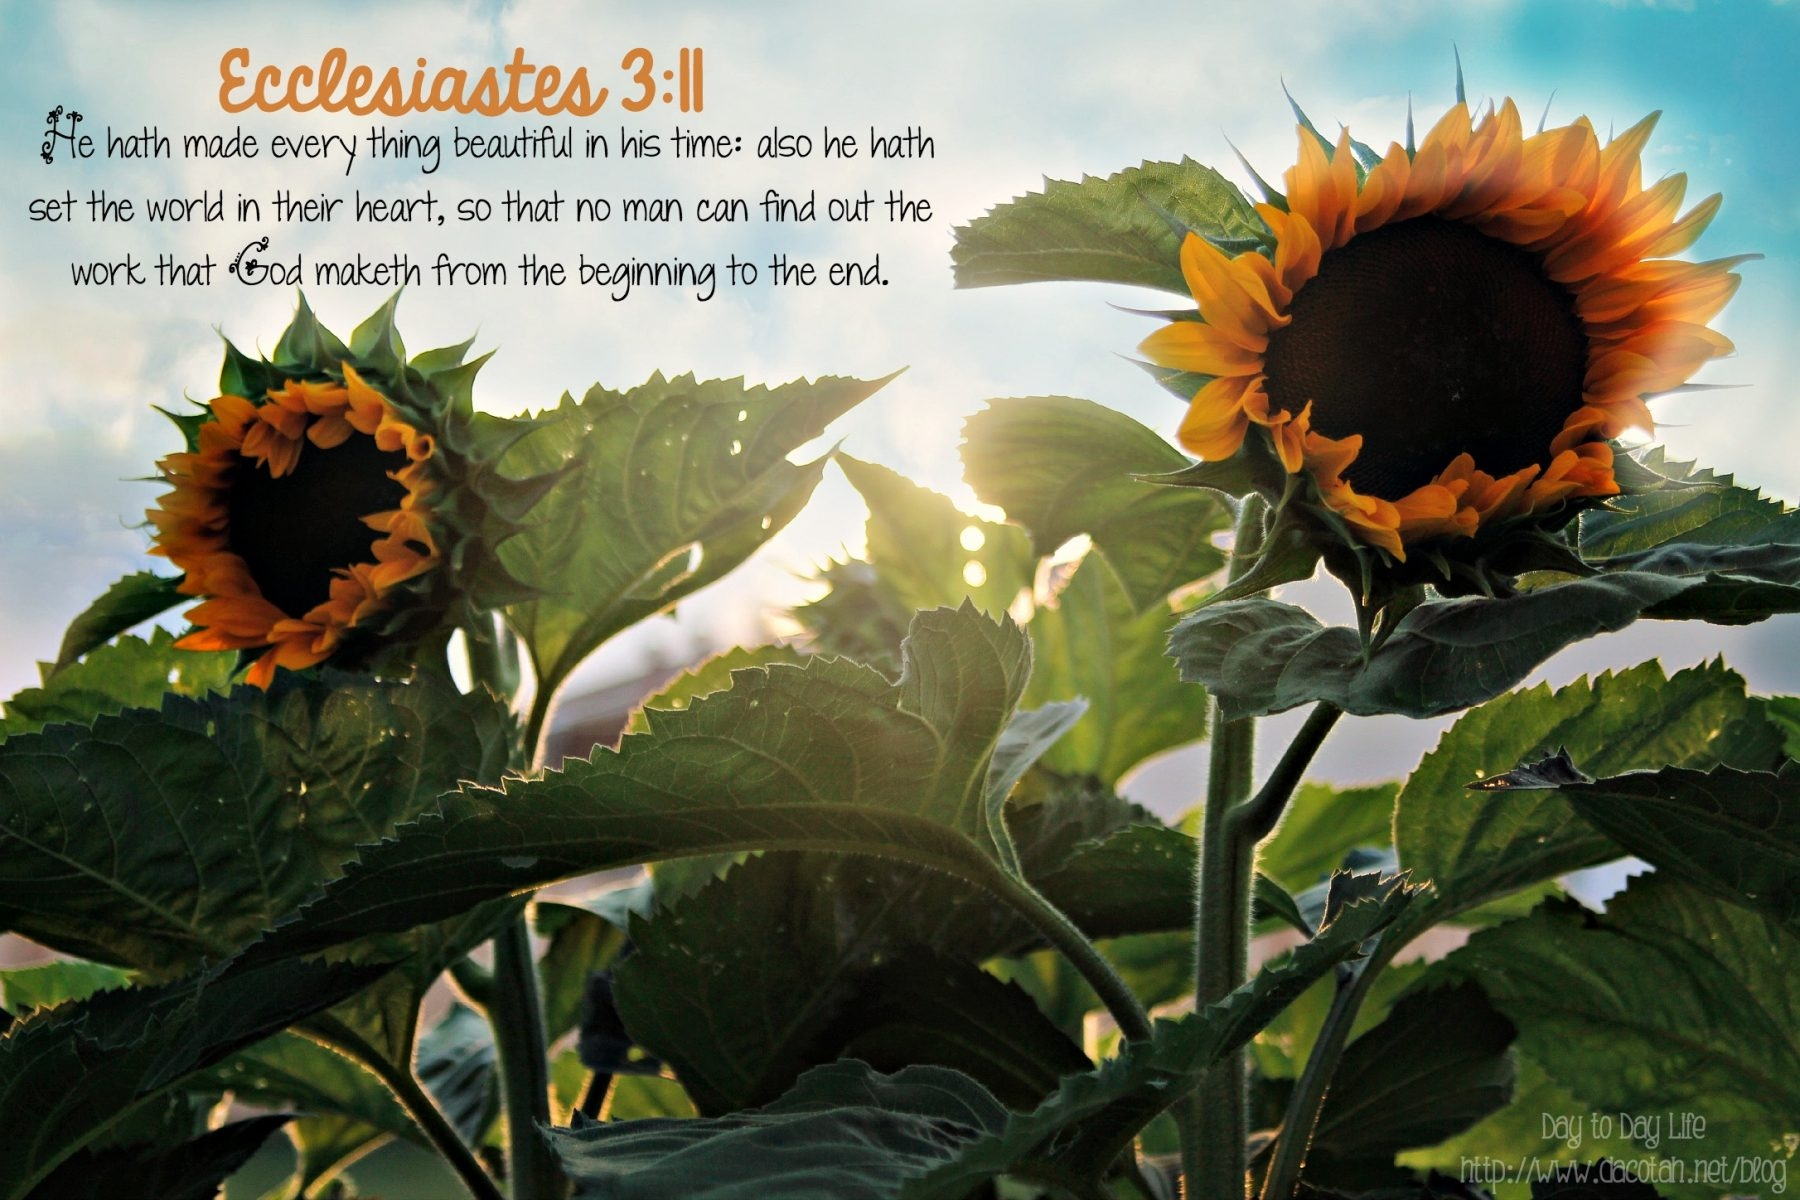 D2DL-Ecclesiastes3:11